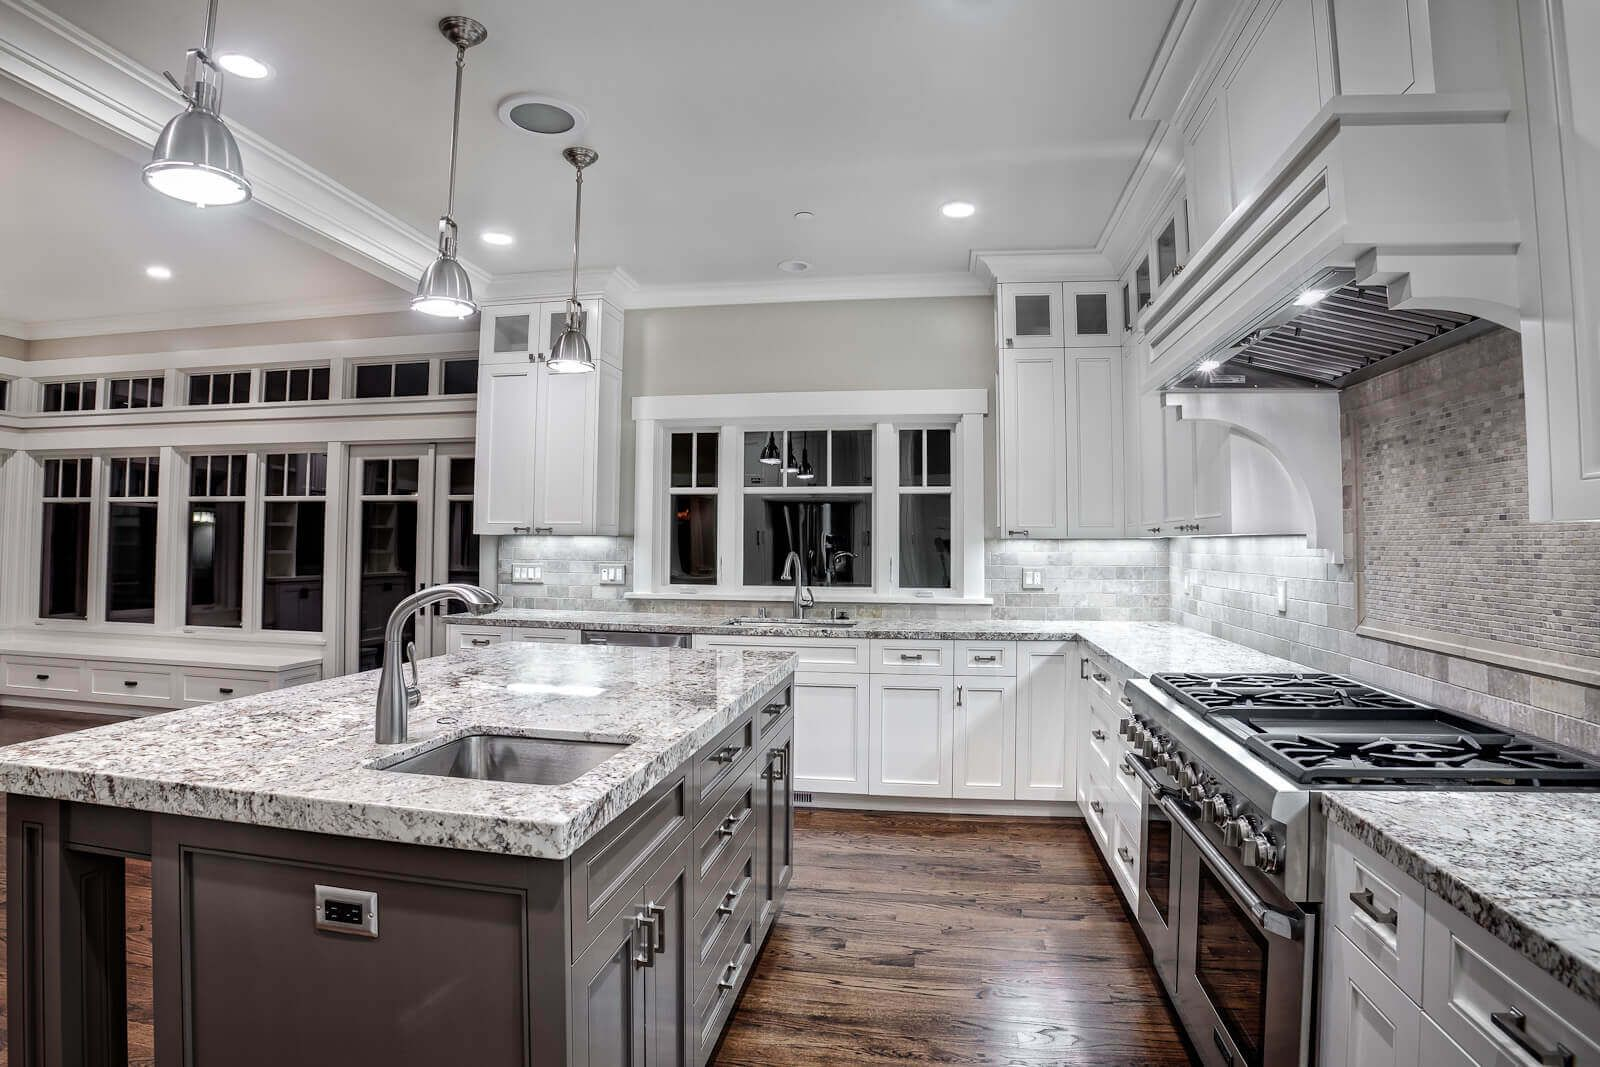 9+ Great Looking Modern Kitchen Gallery   Sinks, Islands ...